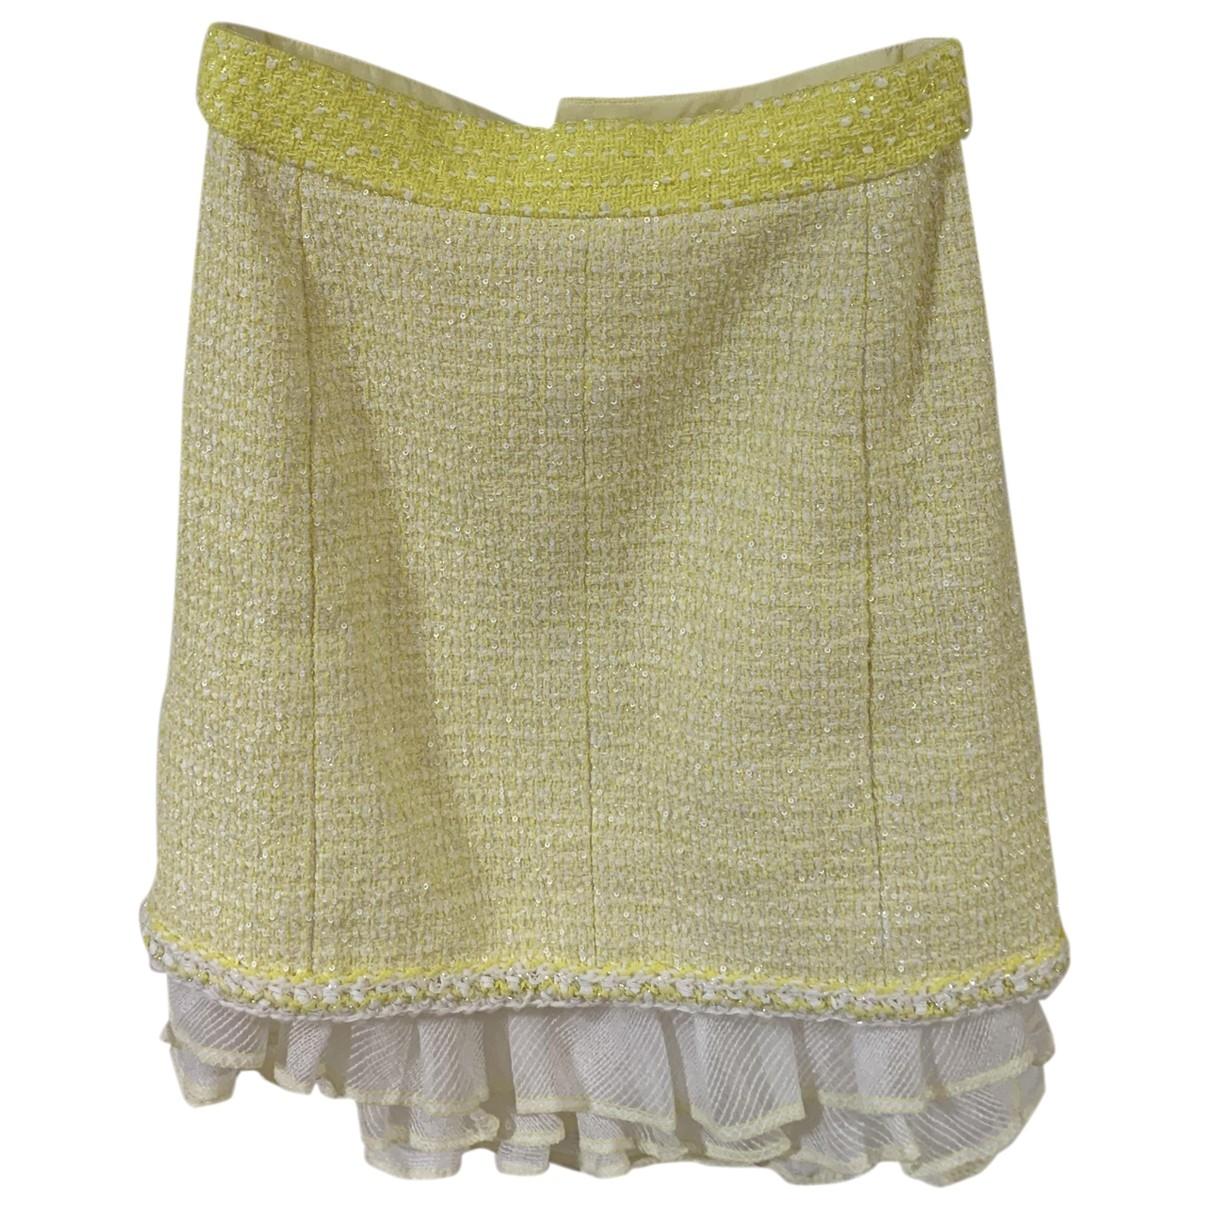 Chanel - Jupe   pour femme en tweed - jaune